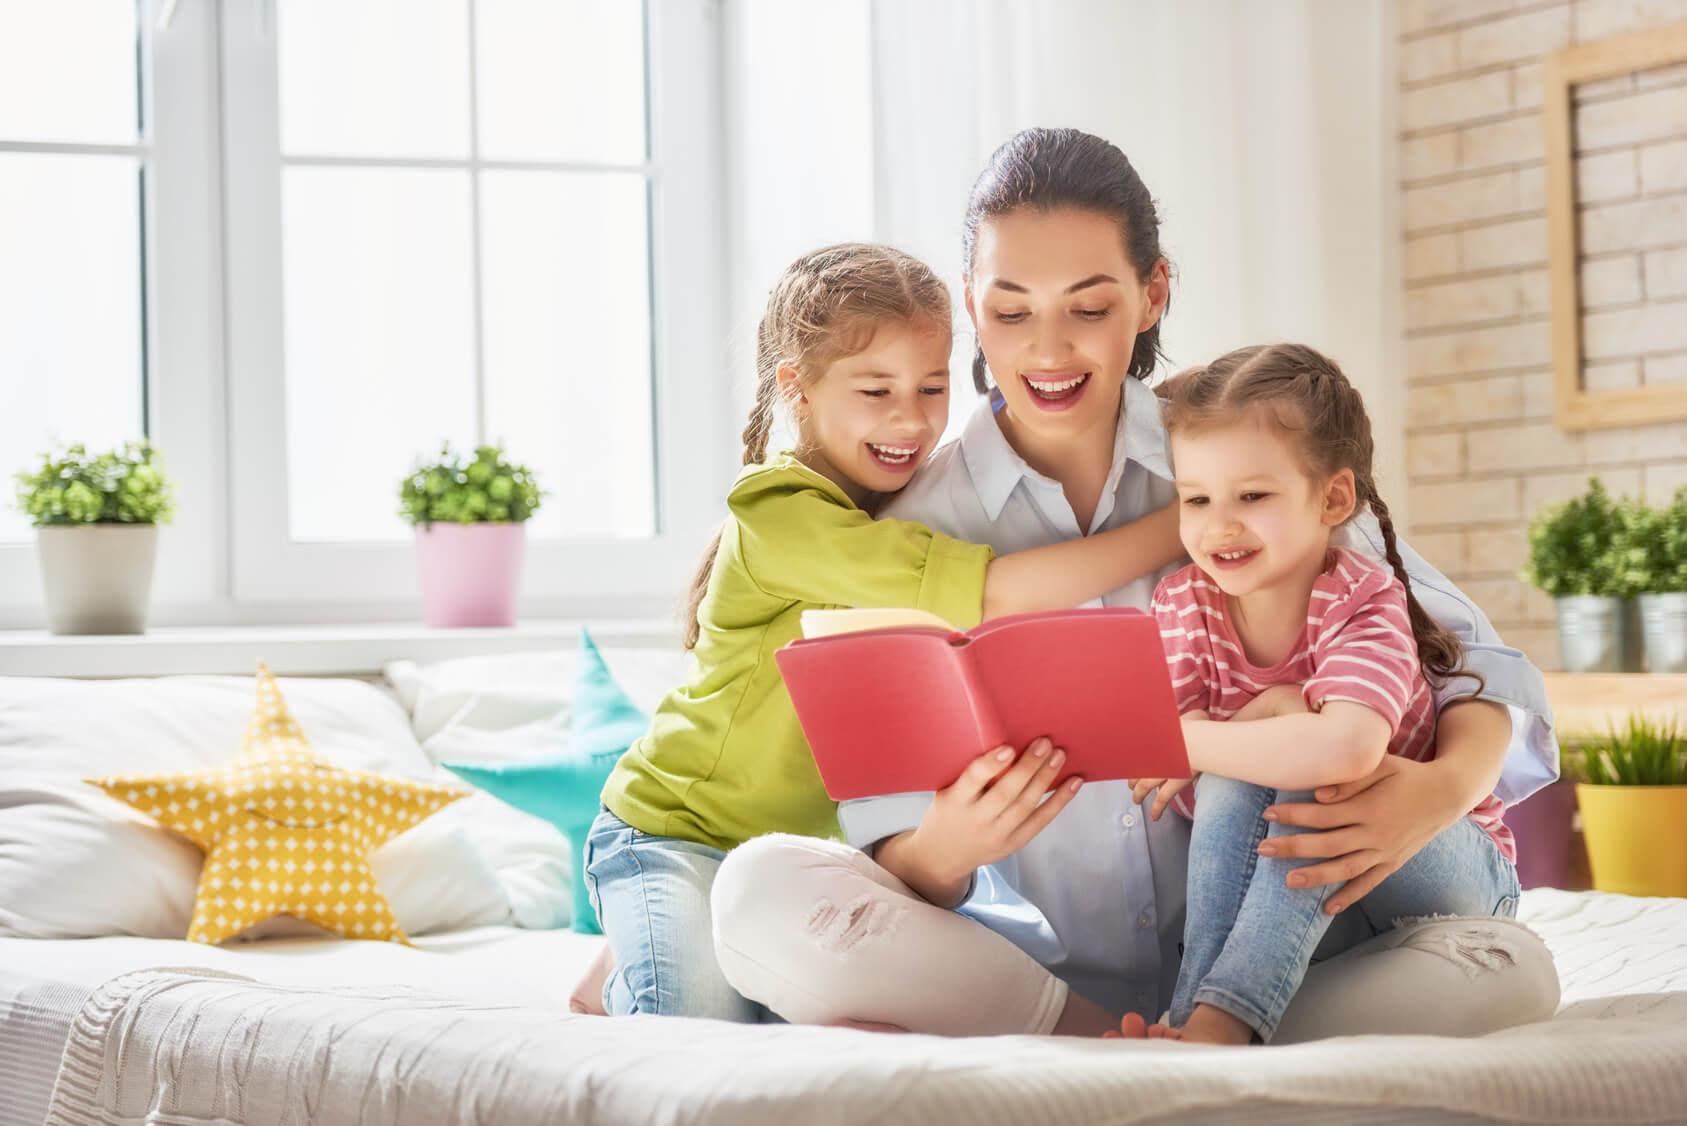 Diagnoza i terapia dziecka ze spectrum autyzmu